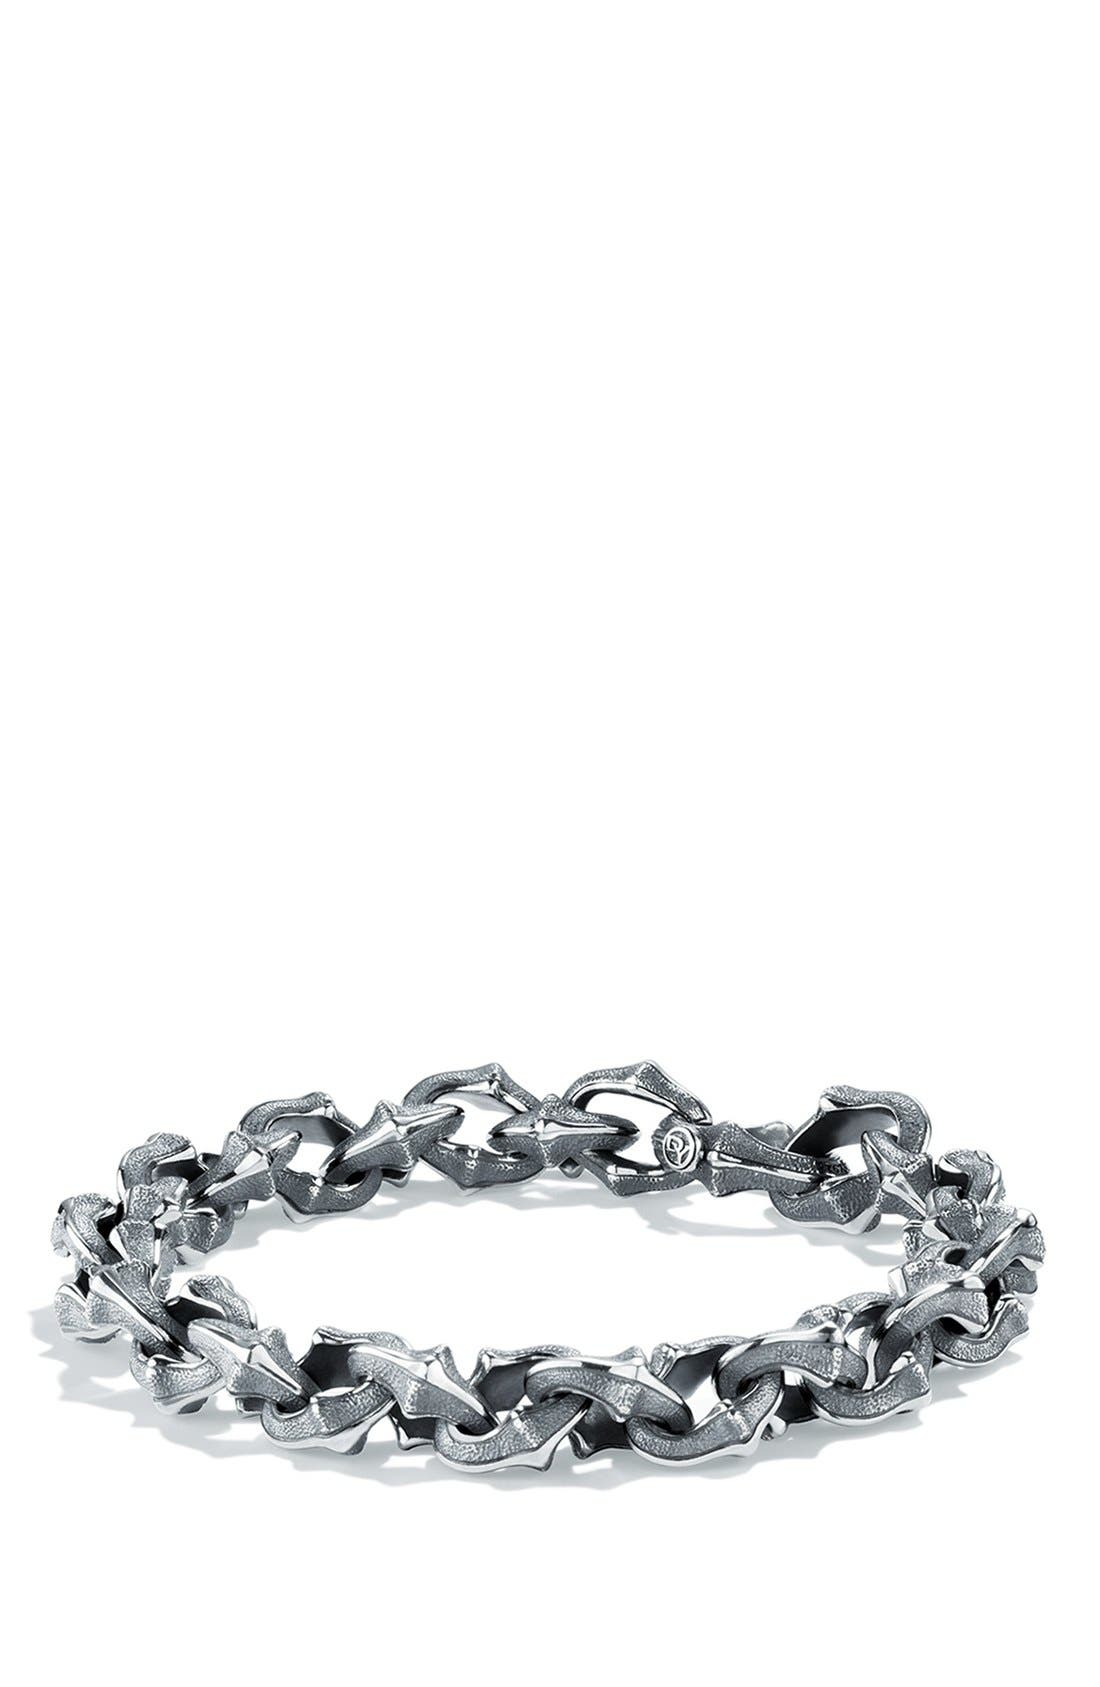 David Yurman 'Armory' Small Link Bracelet